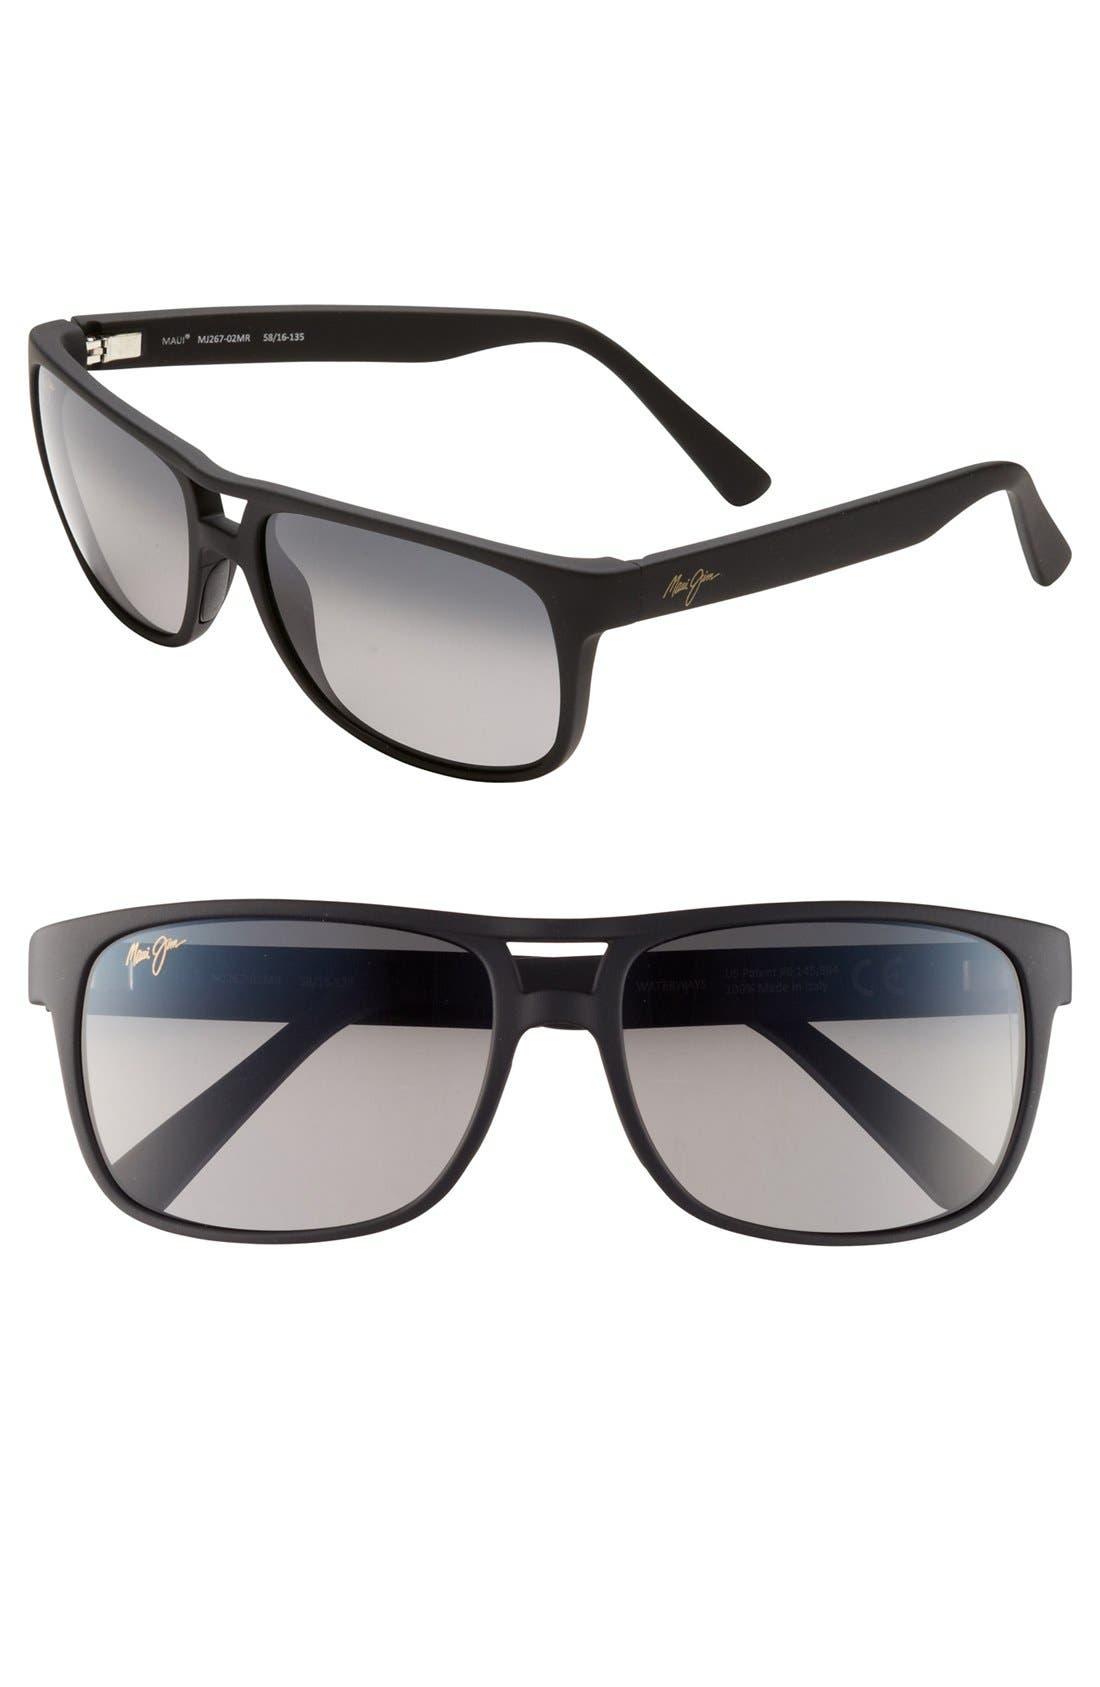 Maui Jim 'Waterways - PolarizedPlus®2' 58mm Sunglasses